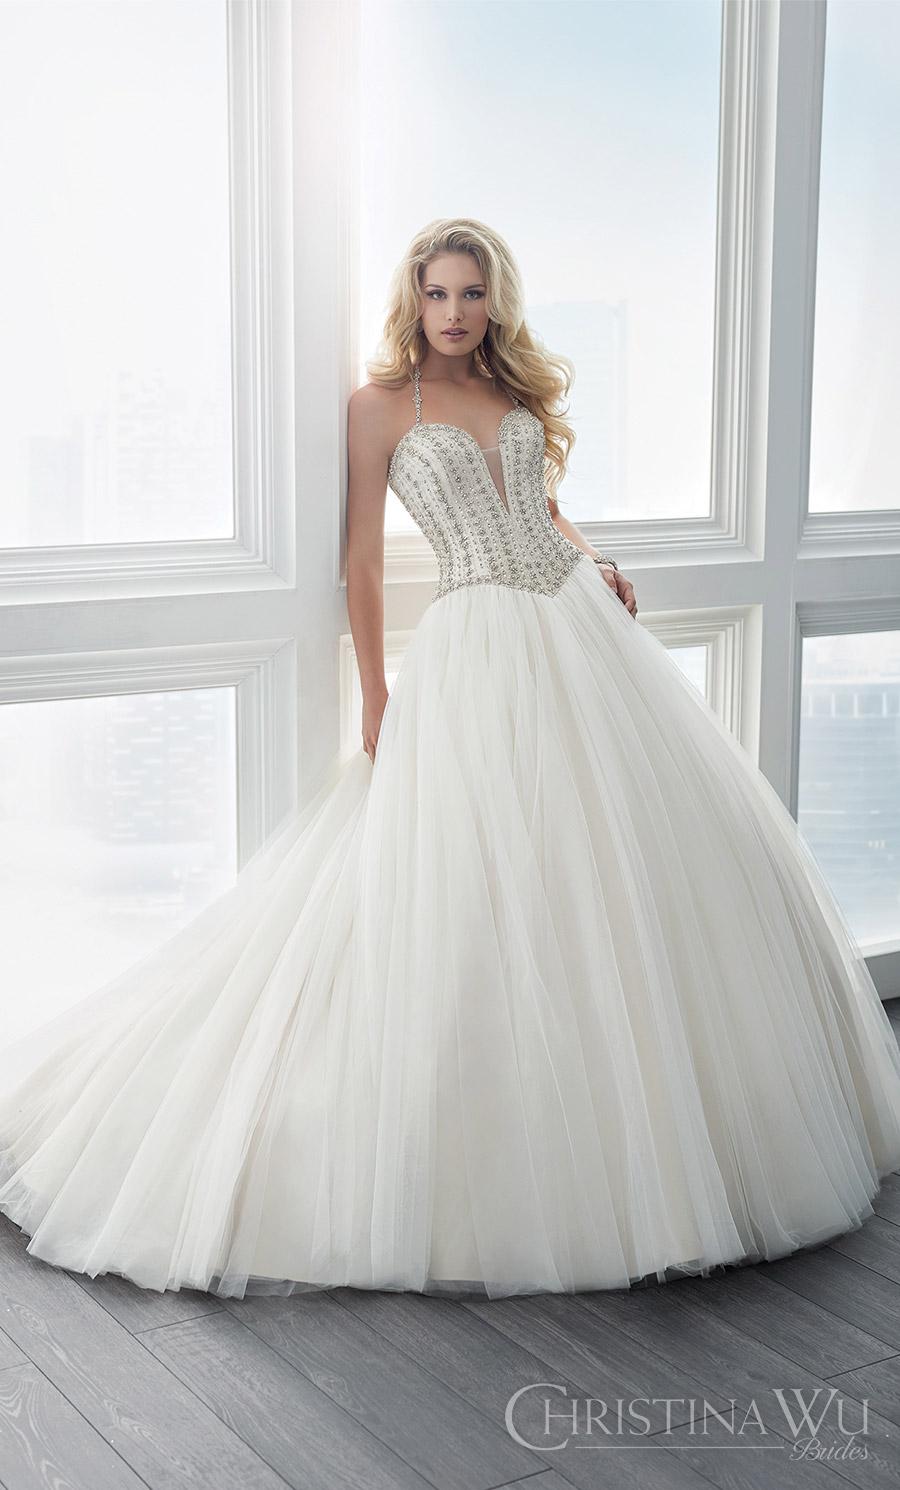 christina wu brides spring 2017 bridal sleeveless beaded straps deep sweetheart embellished bodice ball gown wedding dress (15616) mv romantic princess